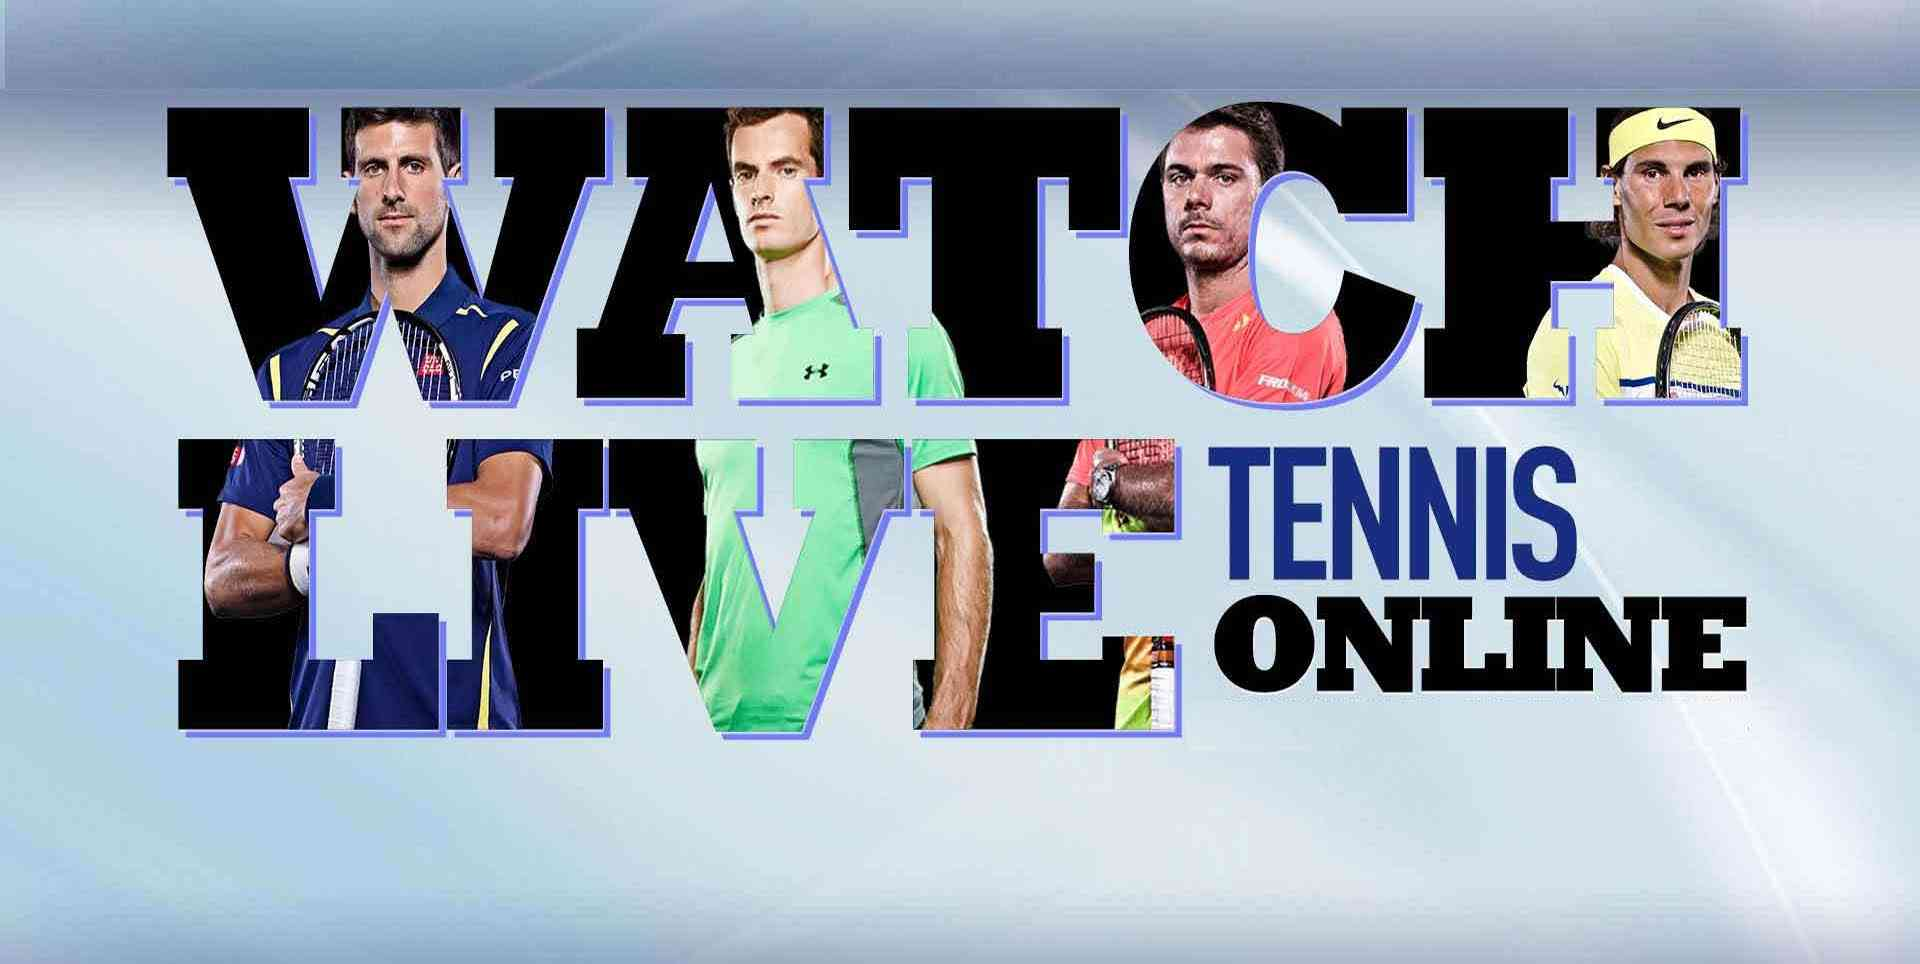 R. Federer vs N. Djokovic